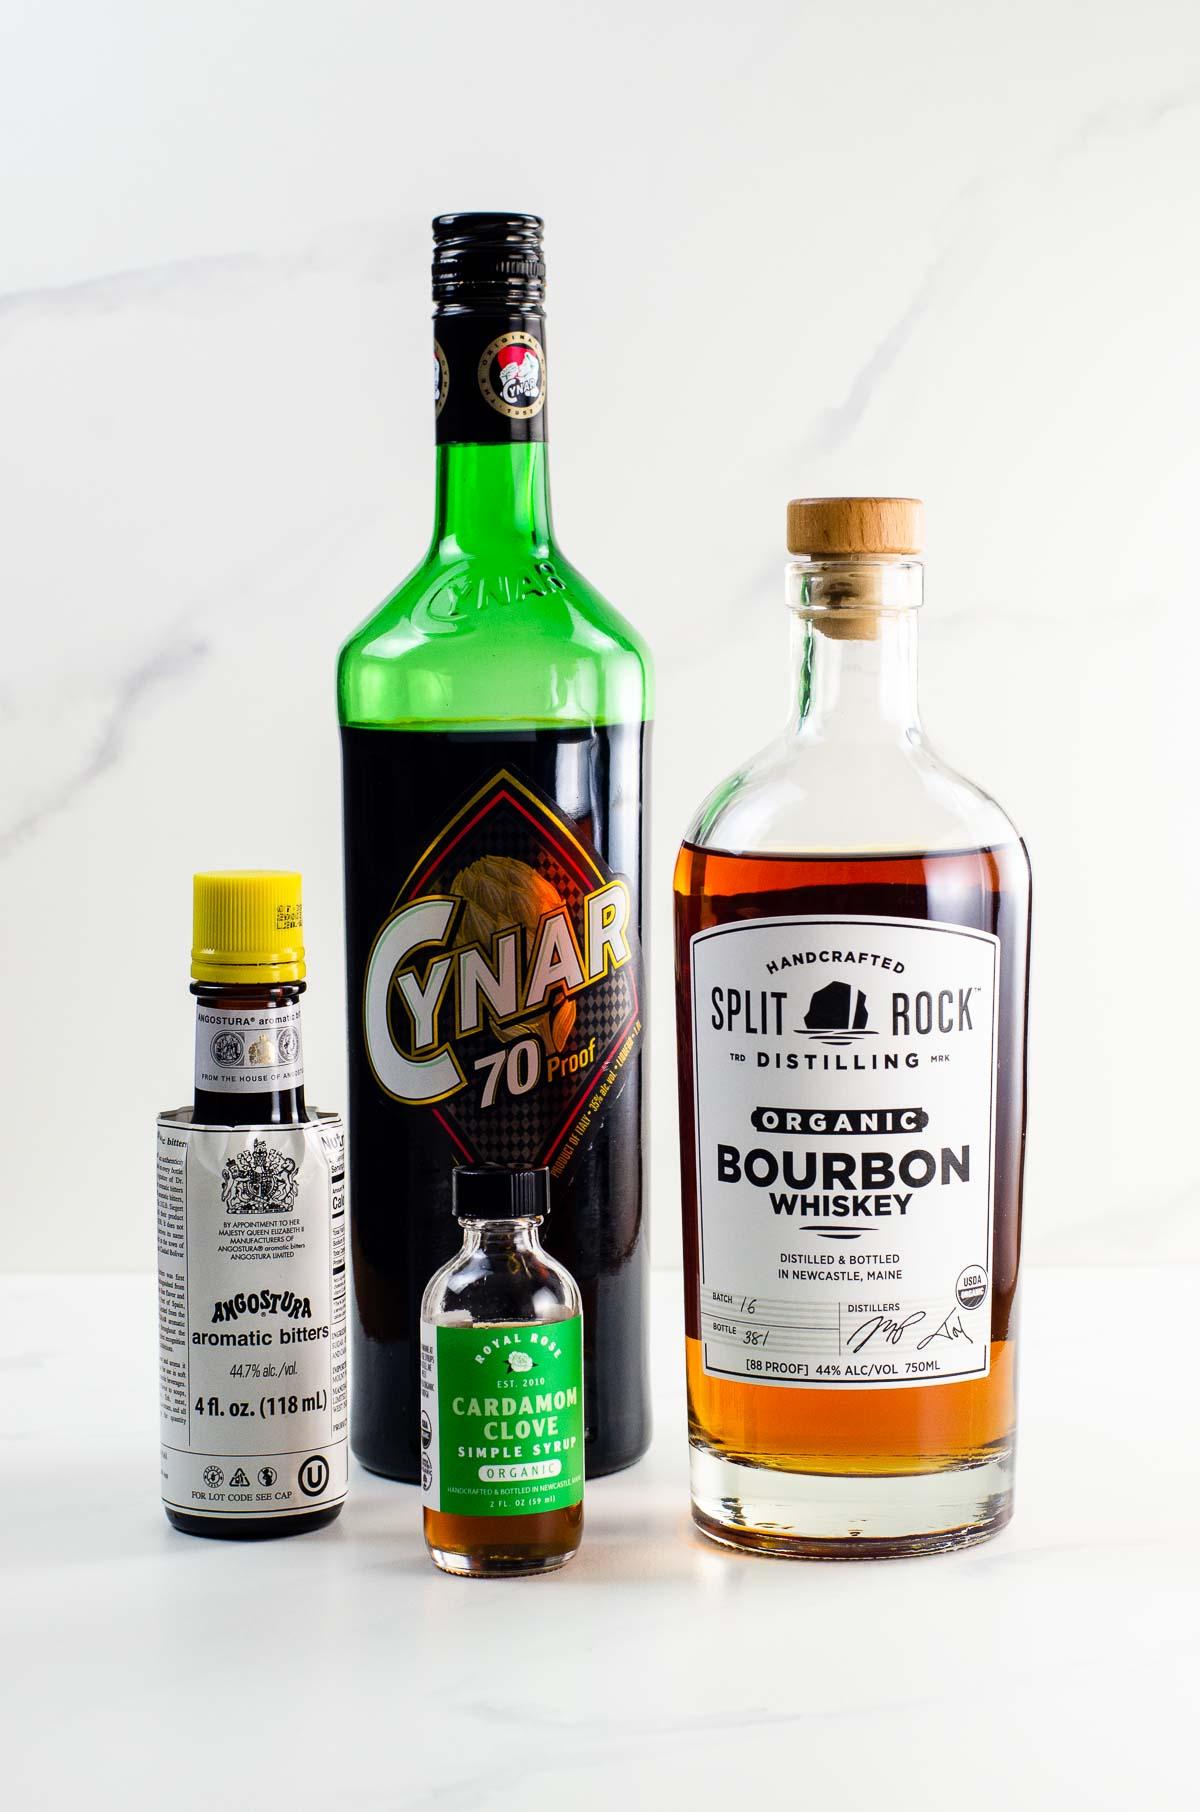 Split Rock bourbon, Cynar, Angostura bitters, and Royal Rose cardamom clove syrup